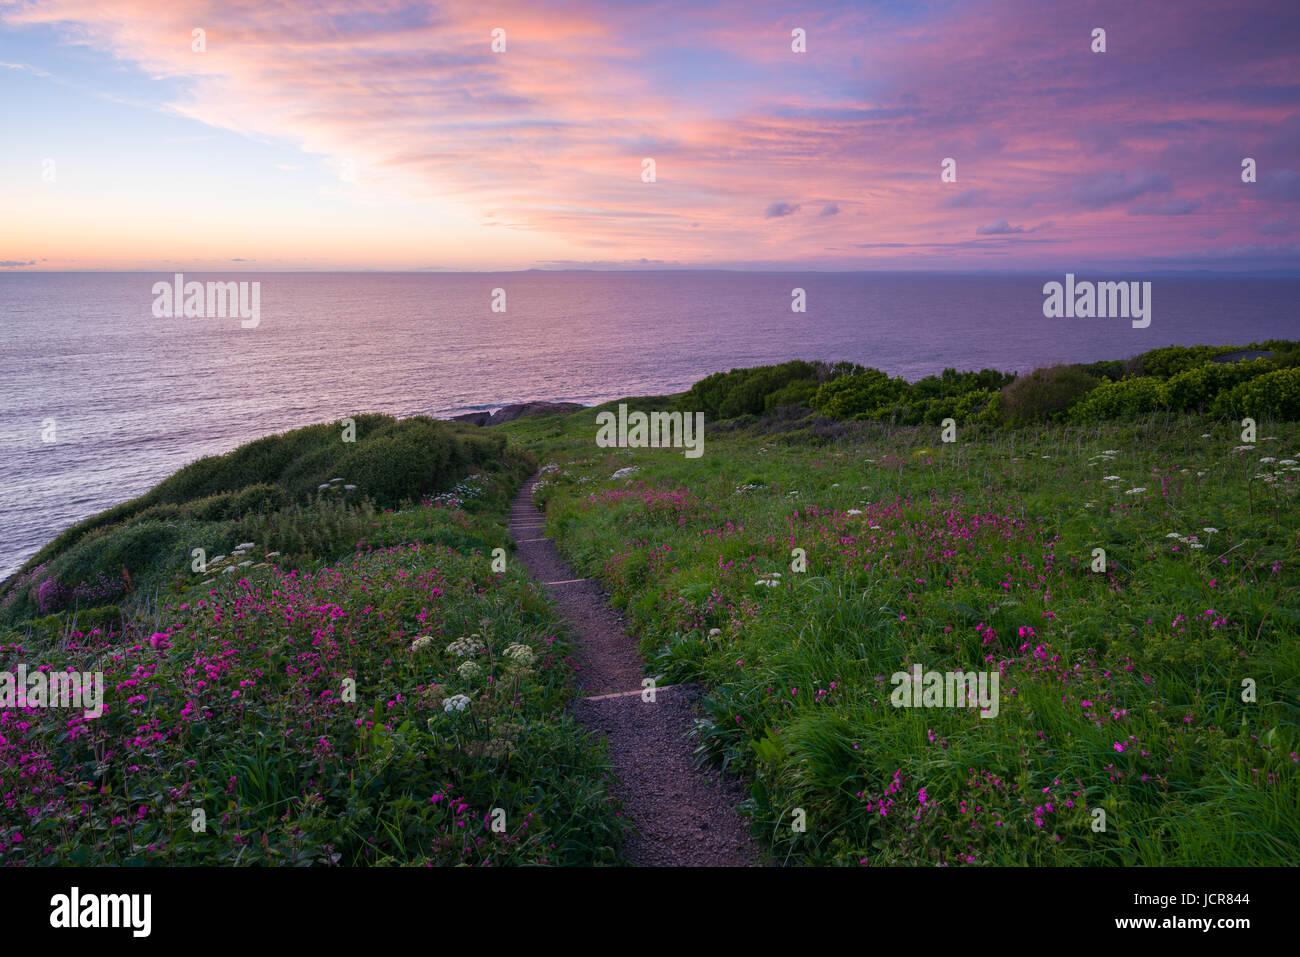 Sea Campion in flower on Rillage Point on the North Devon Heritage Coast at dusk. Ilfracombe, England. Stock Photo